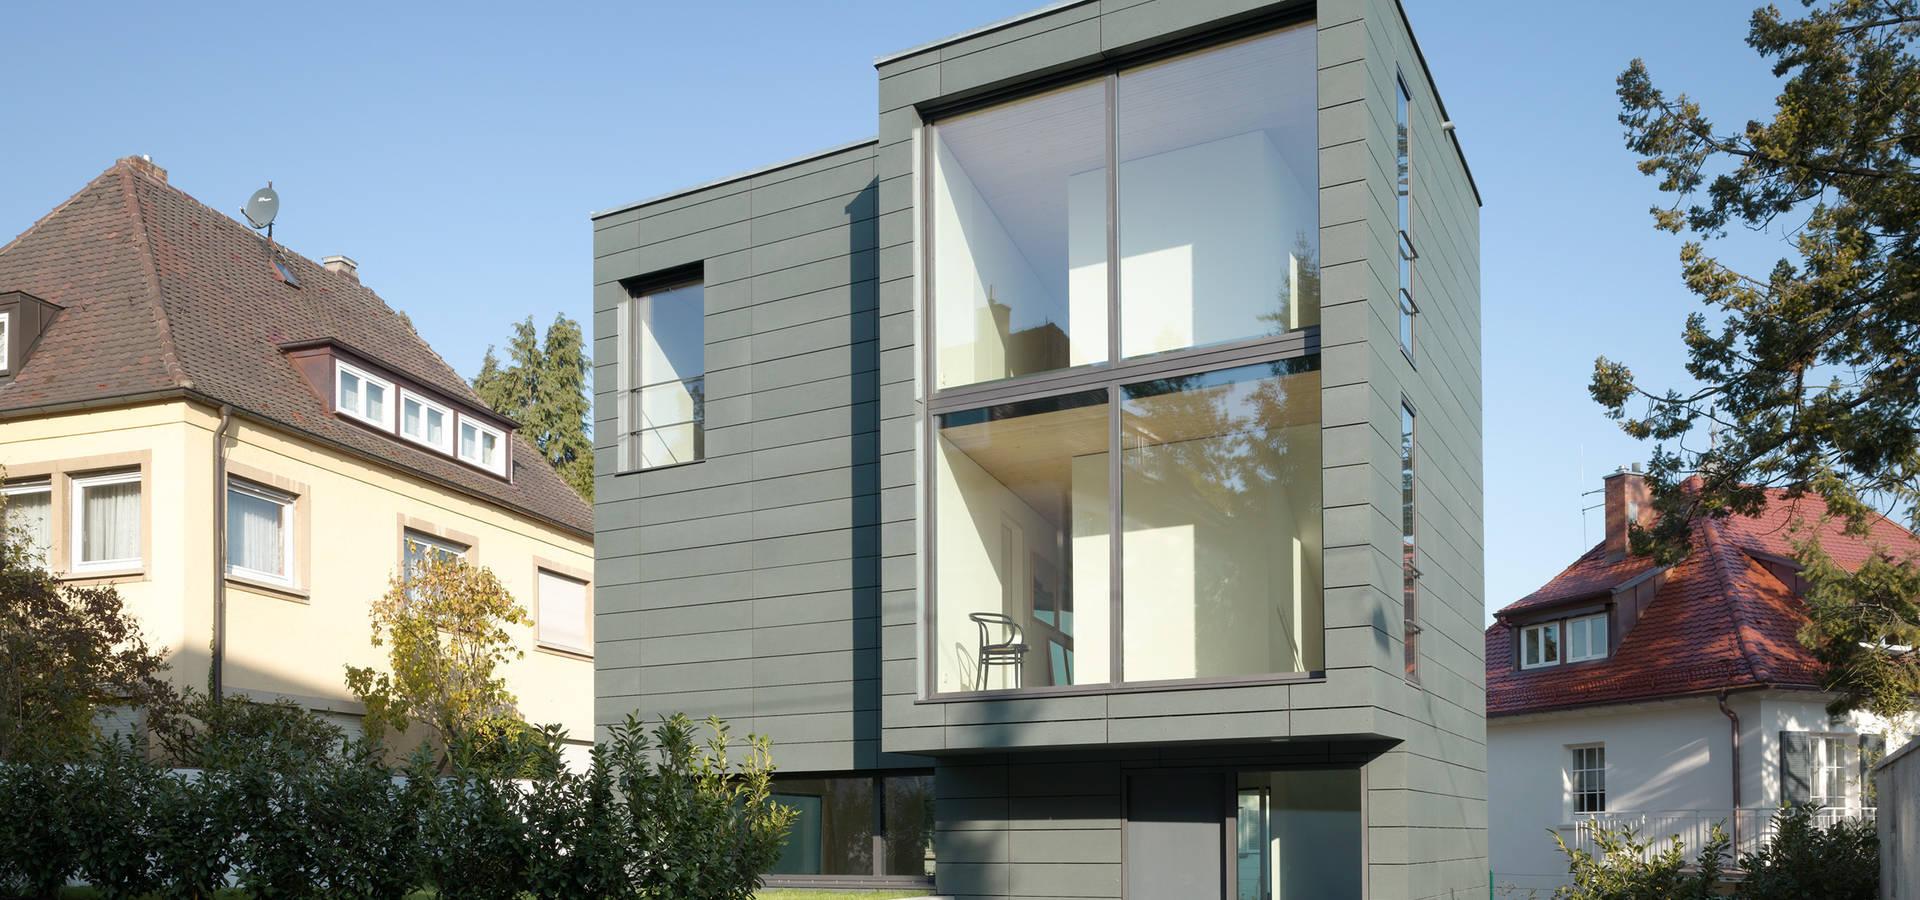 haus k2 by bottega ehrhardt architekten gmbh homify. Black Bedroom Furniture Sets. Home Design Ideas